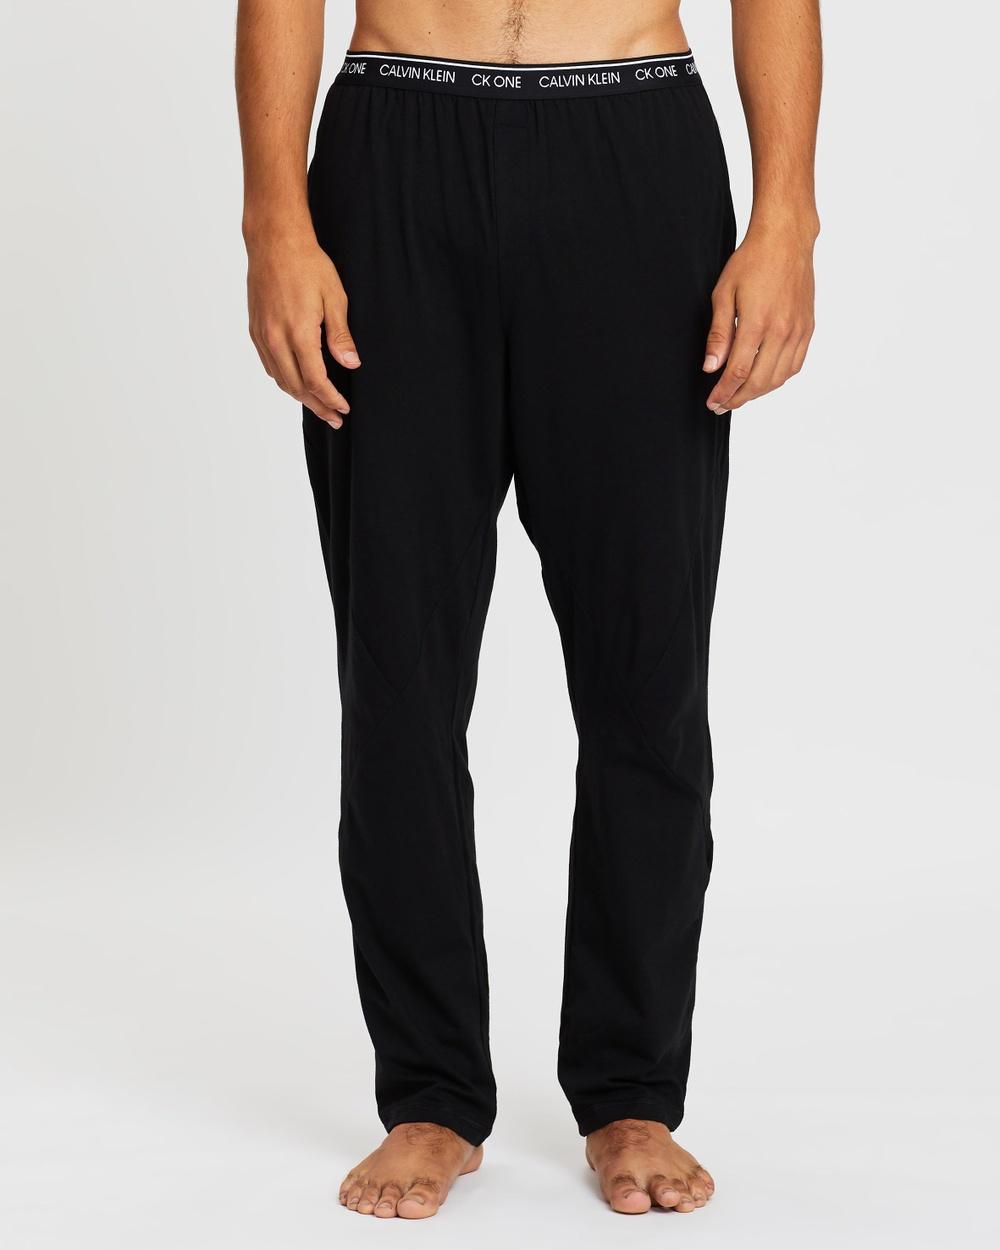 Calvin Klein Sleep Pants Accessories Black & White